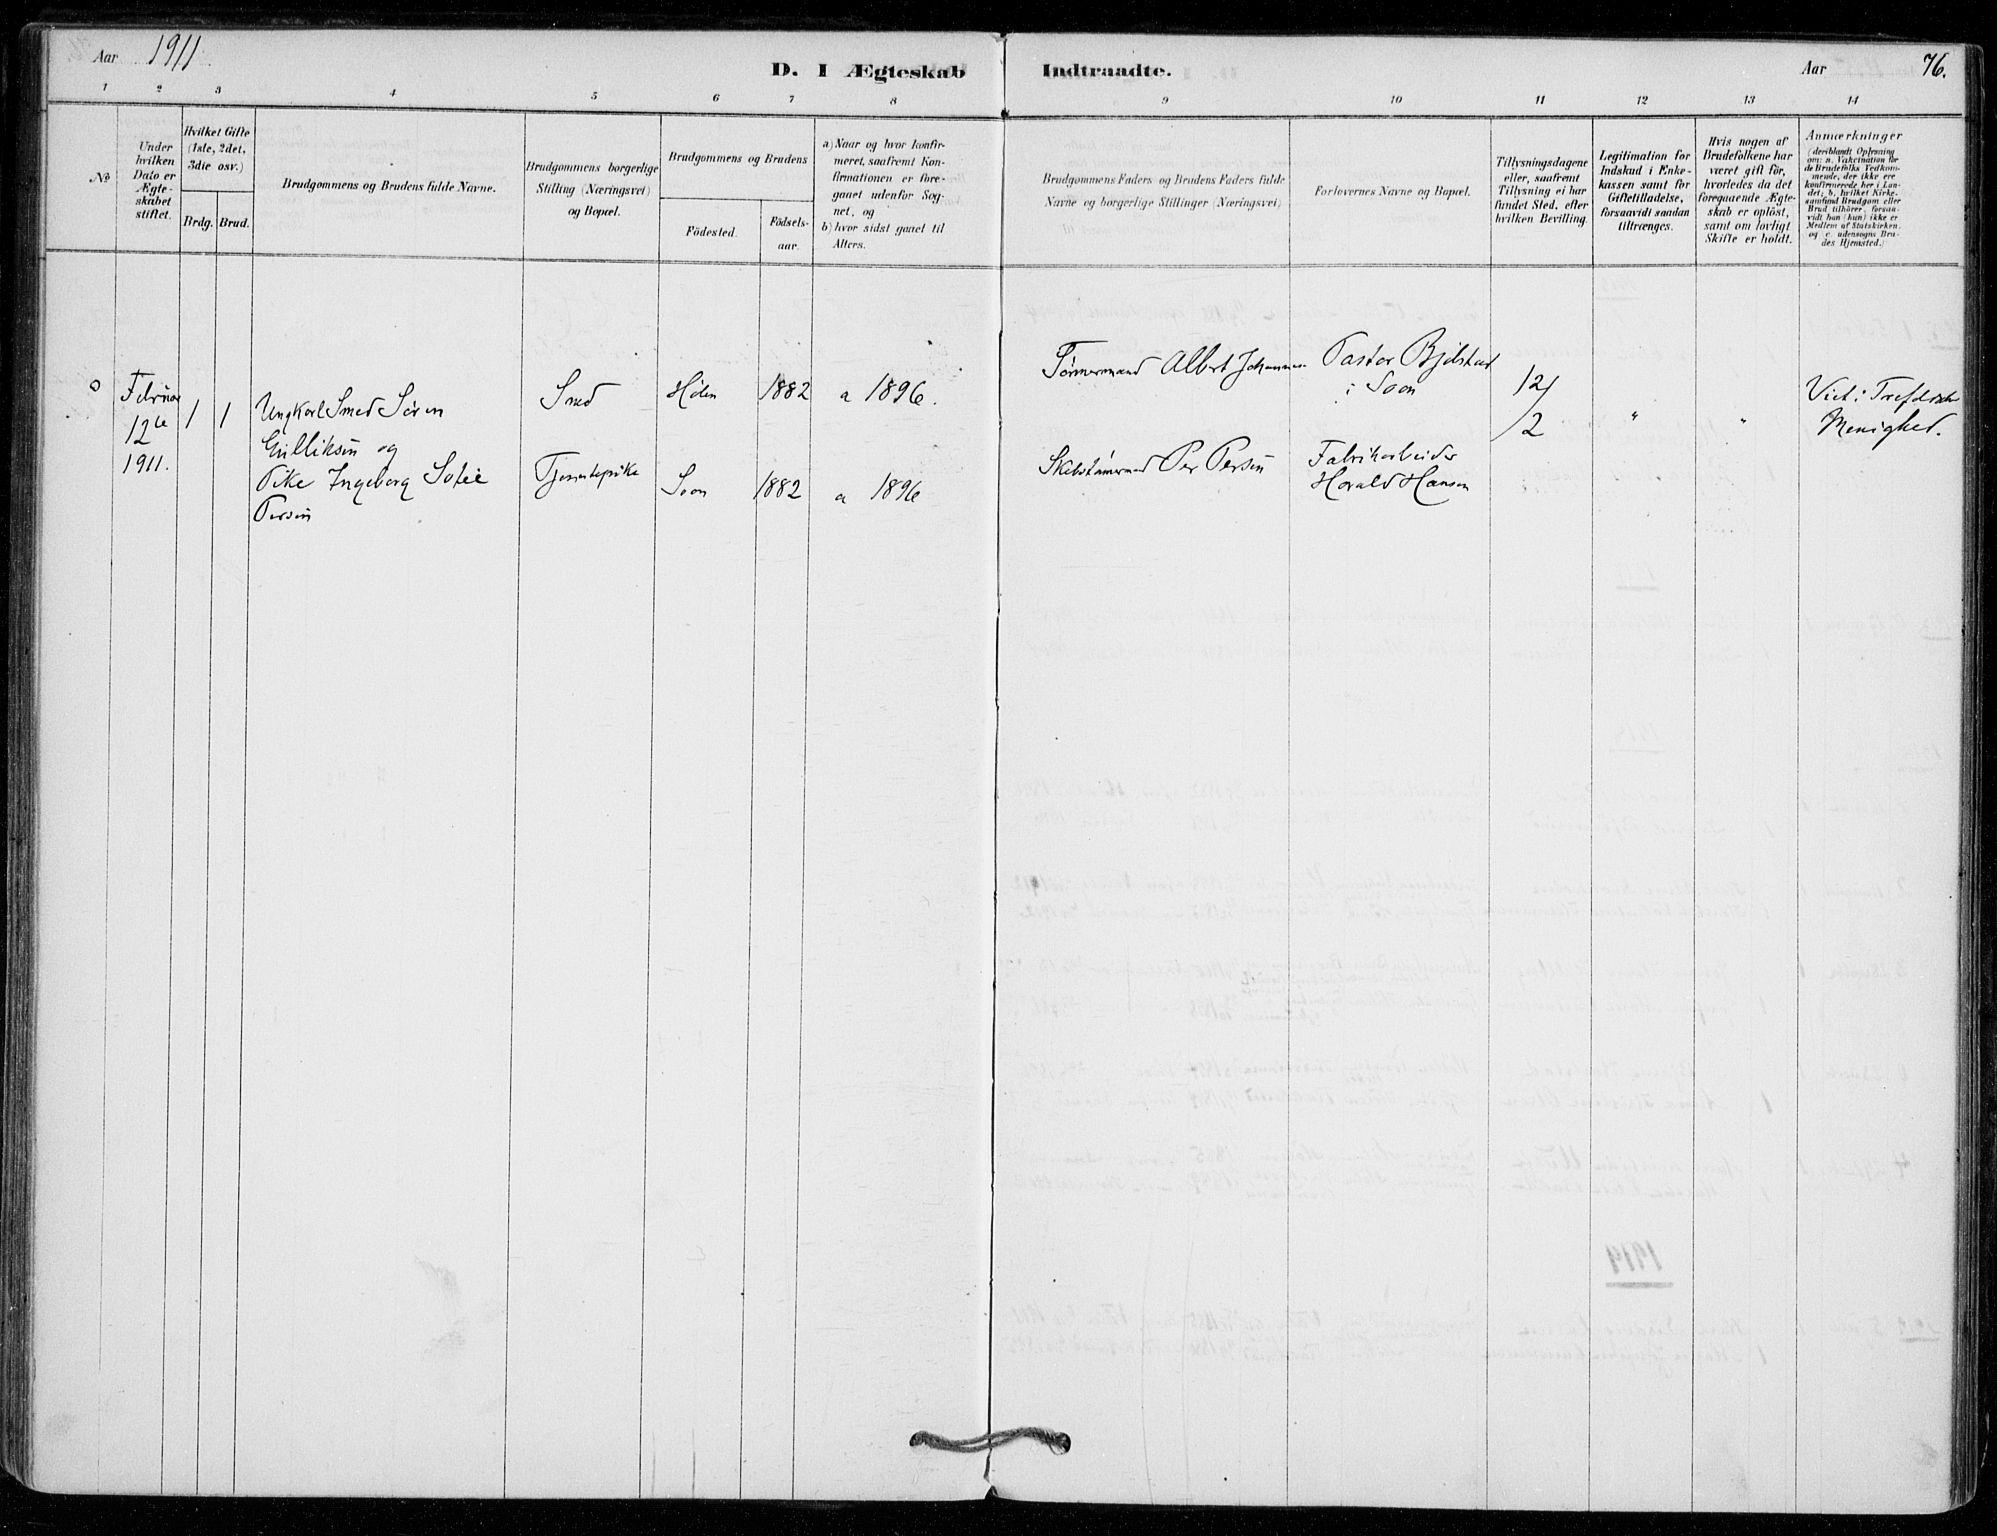 SAO, Vestby prestekontor Kirkebøker, F/Fe/L0001: Ministerialbok nr. V 1, 1878-1931, s. 76